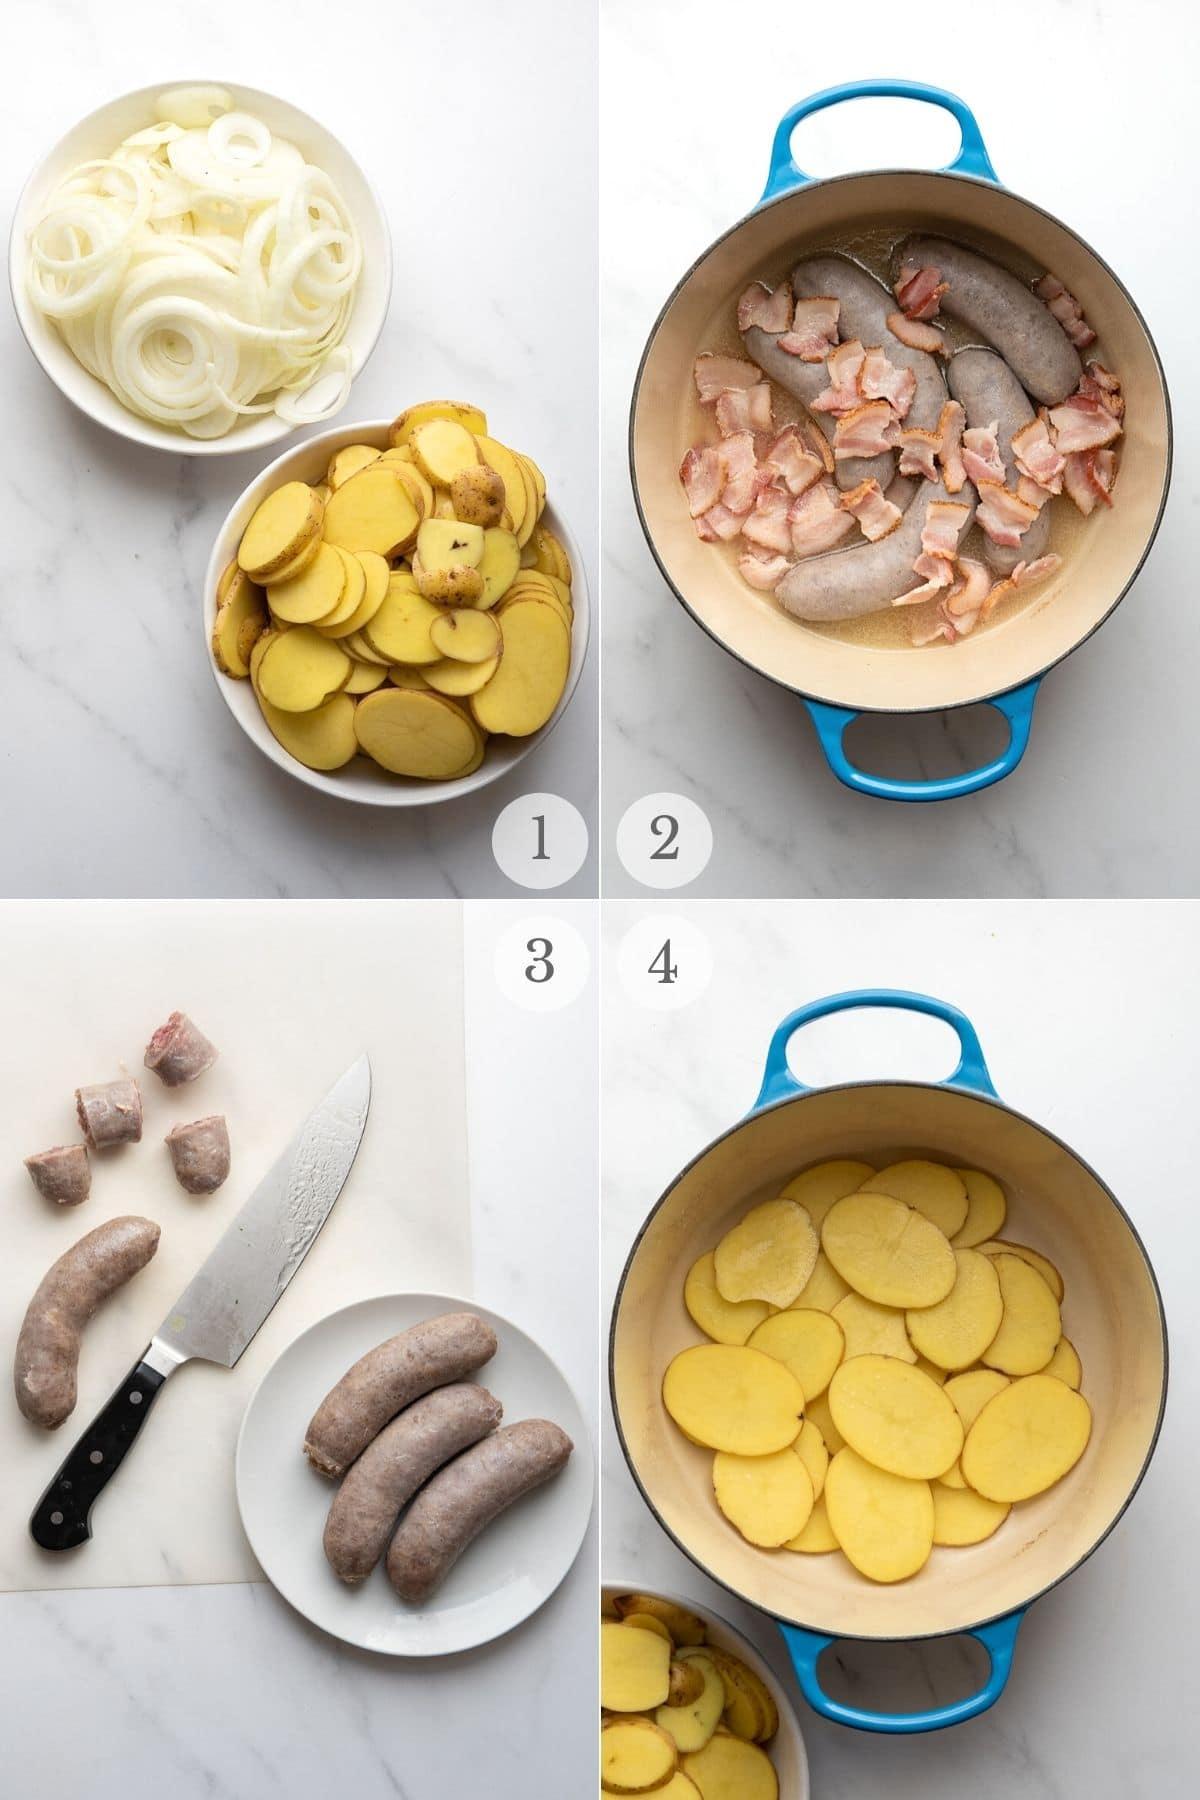 dublin coddle recipe steps 1-4